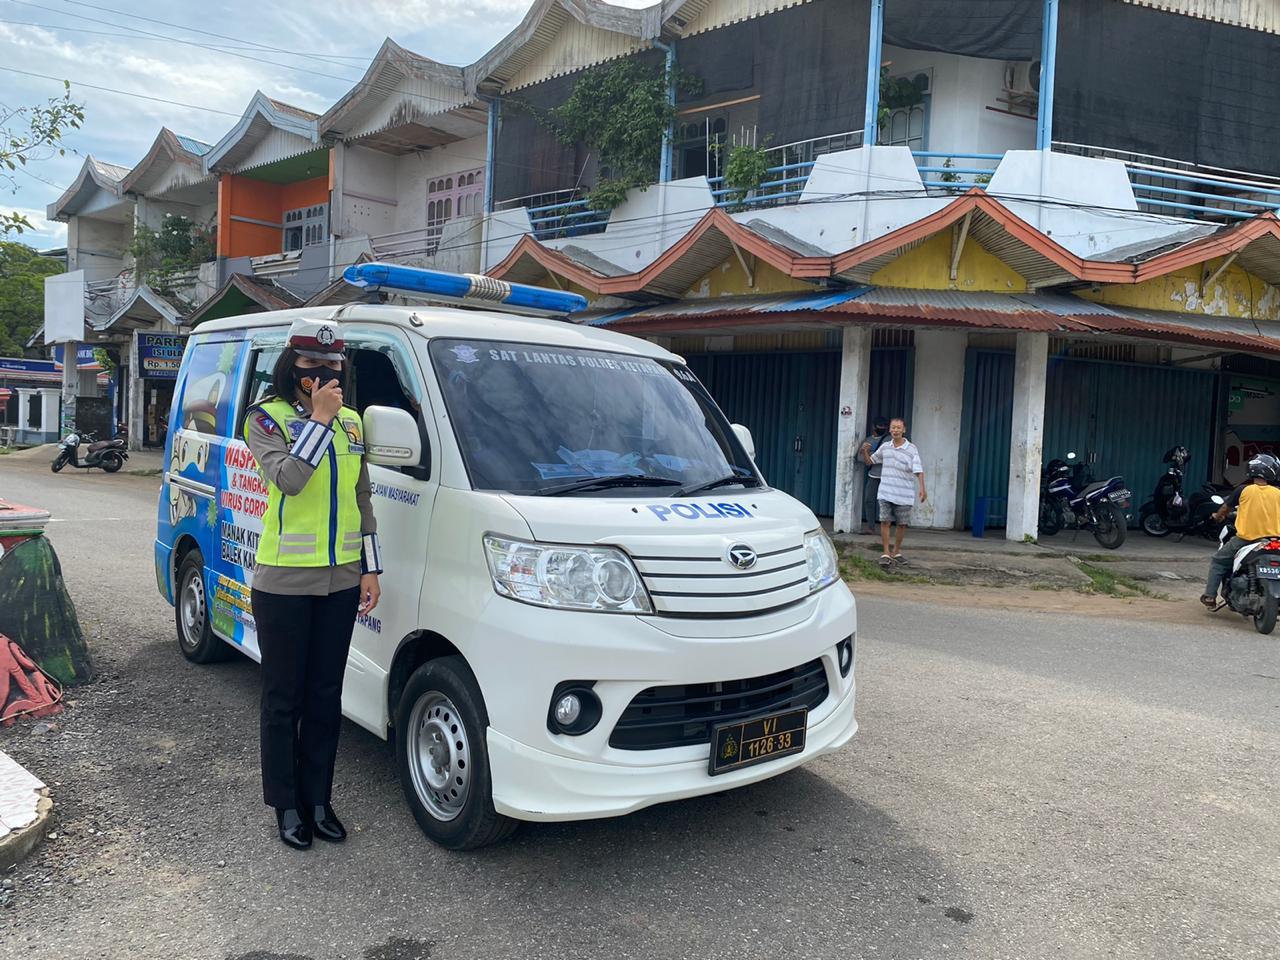 Satlantas Ketapang, Gencar berikan Penling kepada Masyarakat Kota Ketapang